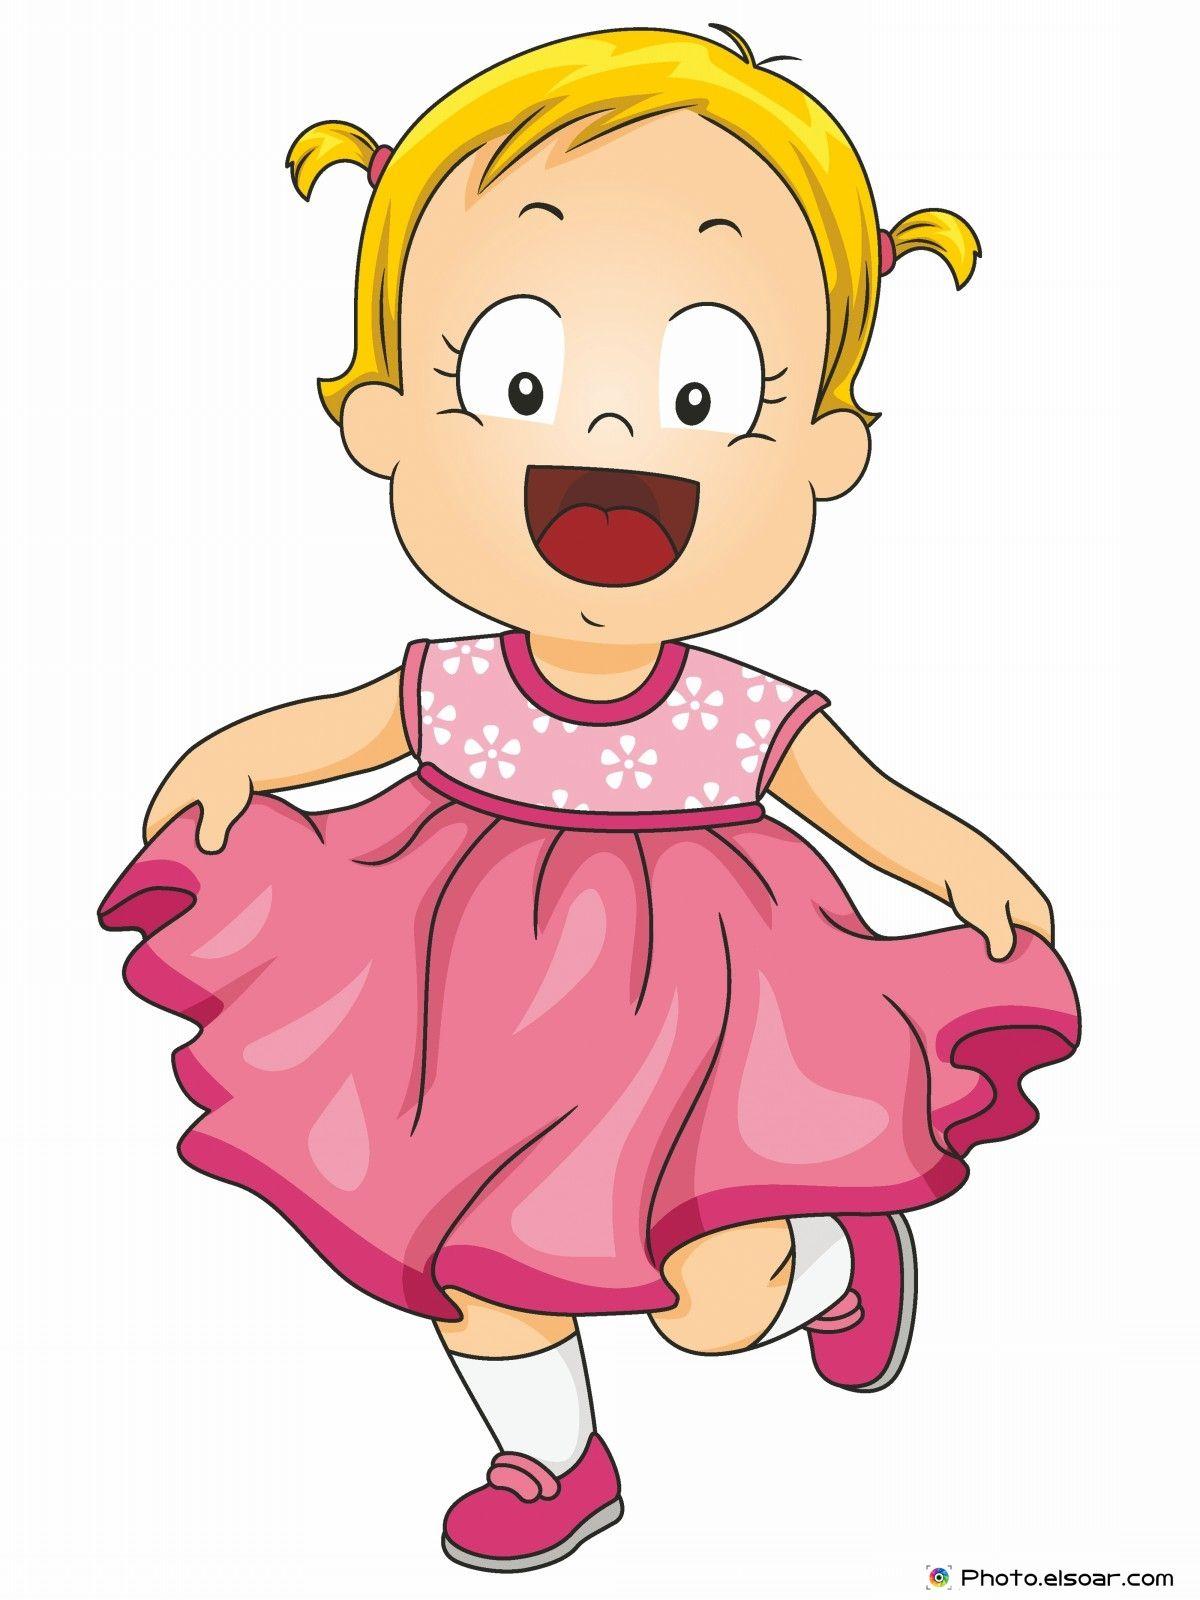 15 Funny Cartoon Kids Pictures Elsoar Baby Girl Pink Dress Cute Baby Girl Pictures Girls Pink Dress